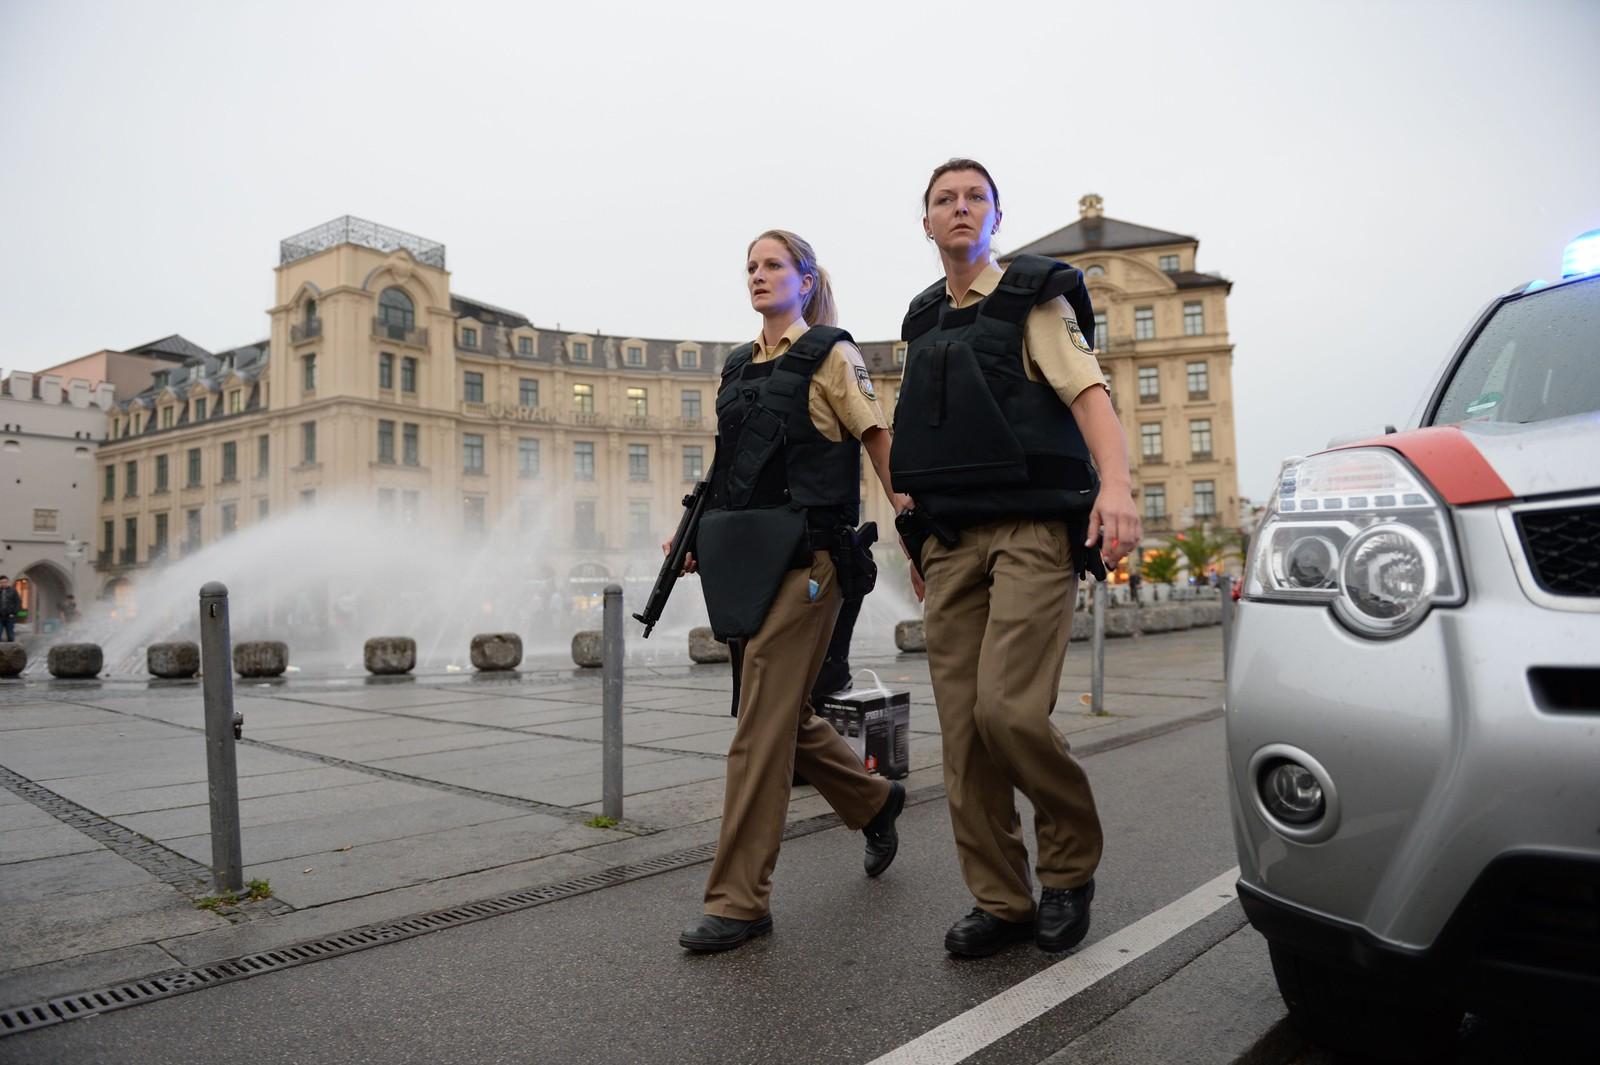 PATRULJERER I GATENE: Politibetjenter patruljerer i området rundt Karlsplatz (Stachus) i München.